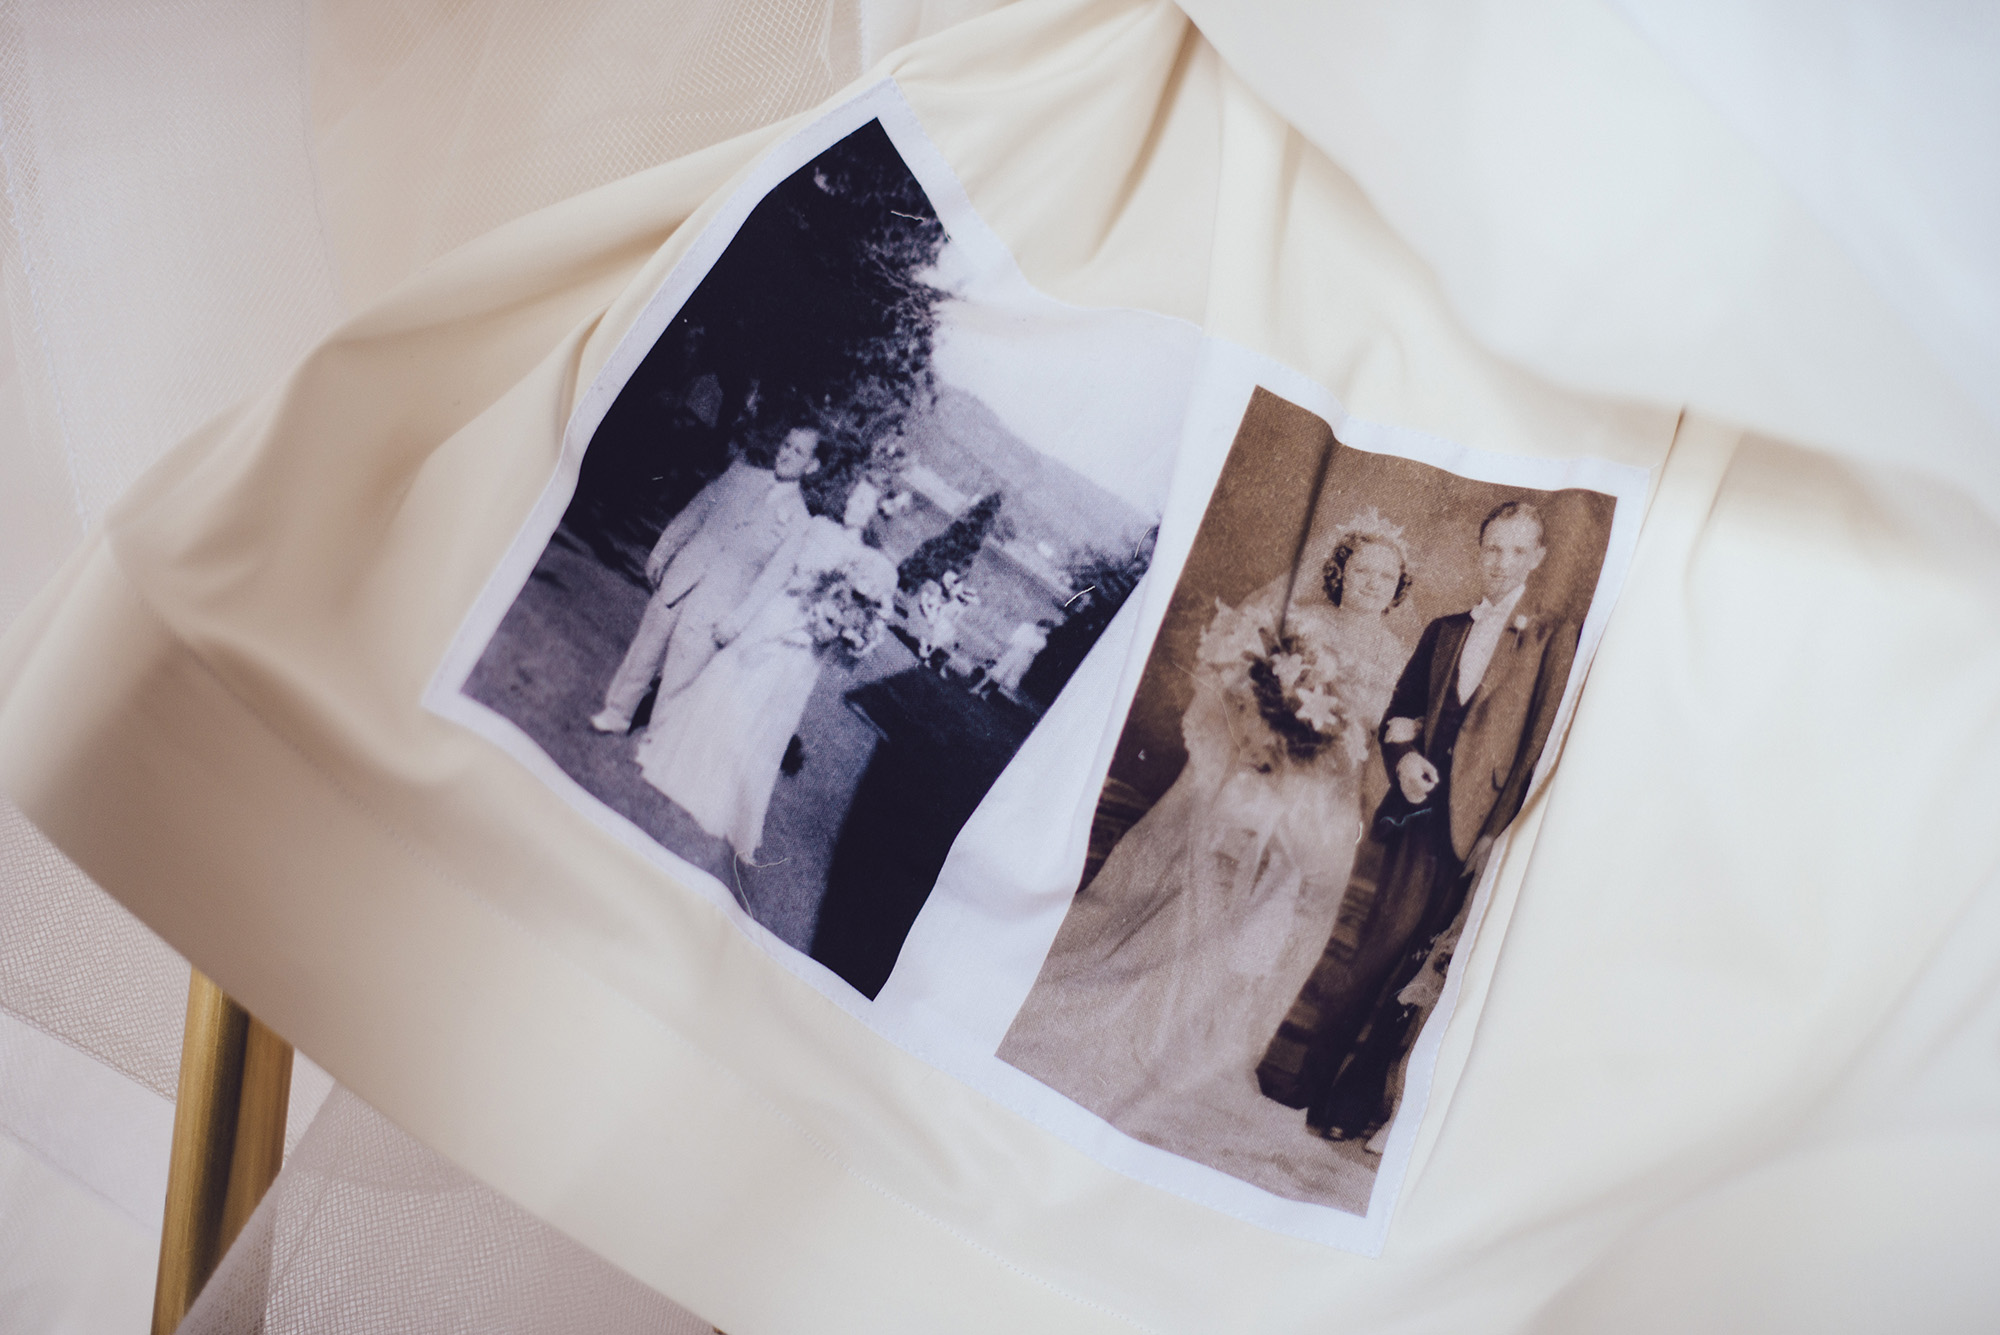 05 Hotel DuPont Wedding Grandparents Photo in Hem of Wedding Dress Family Heirlooms Wedding.jpg